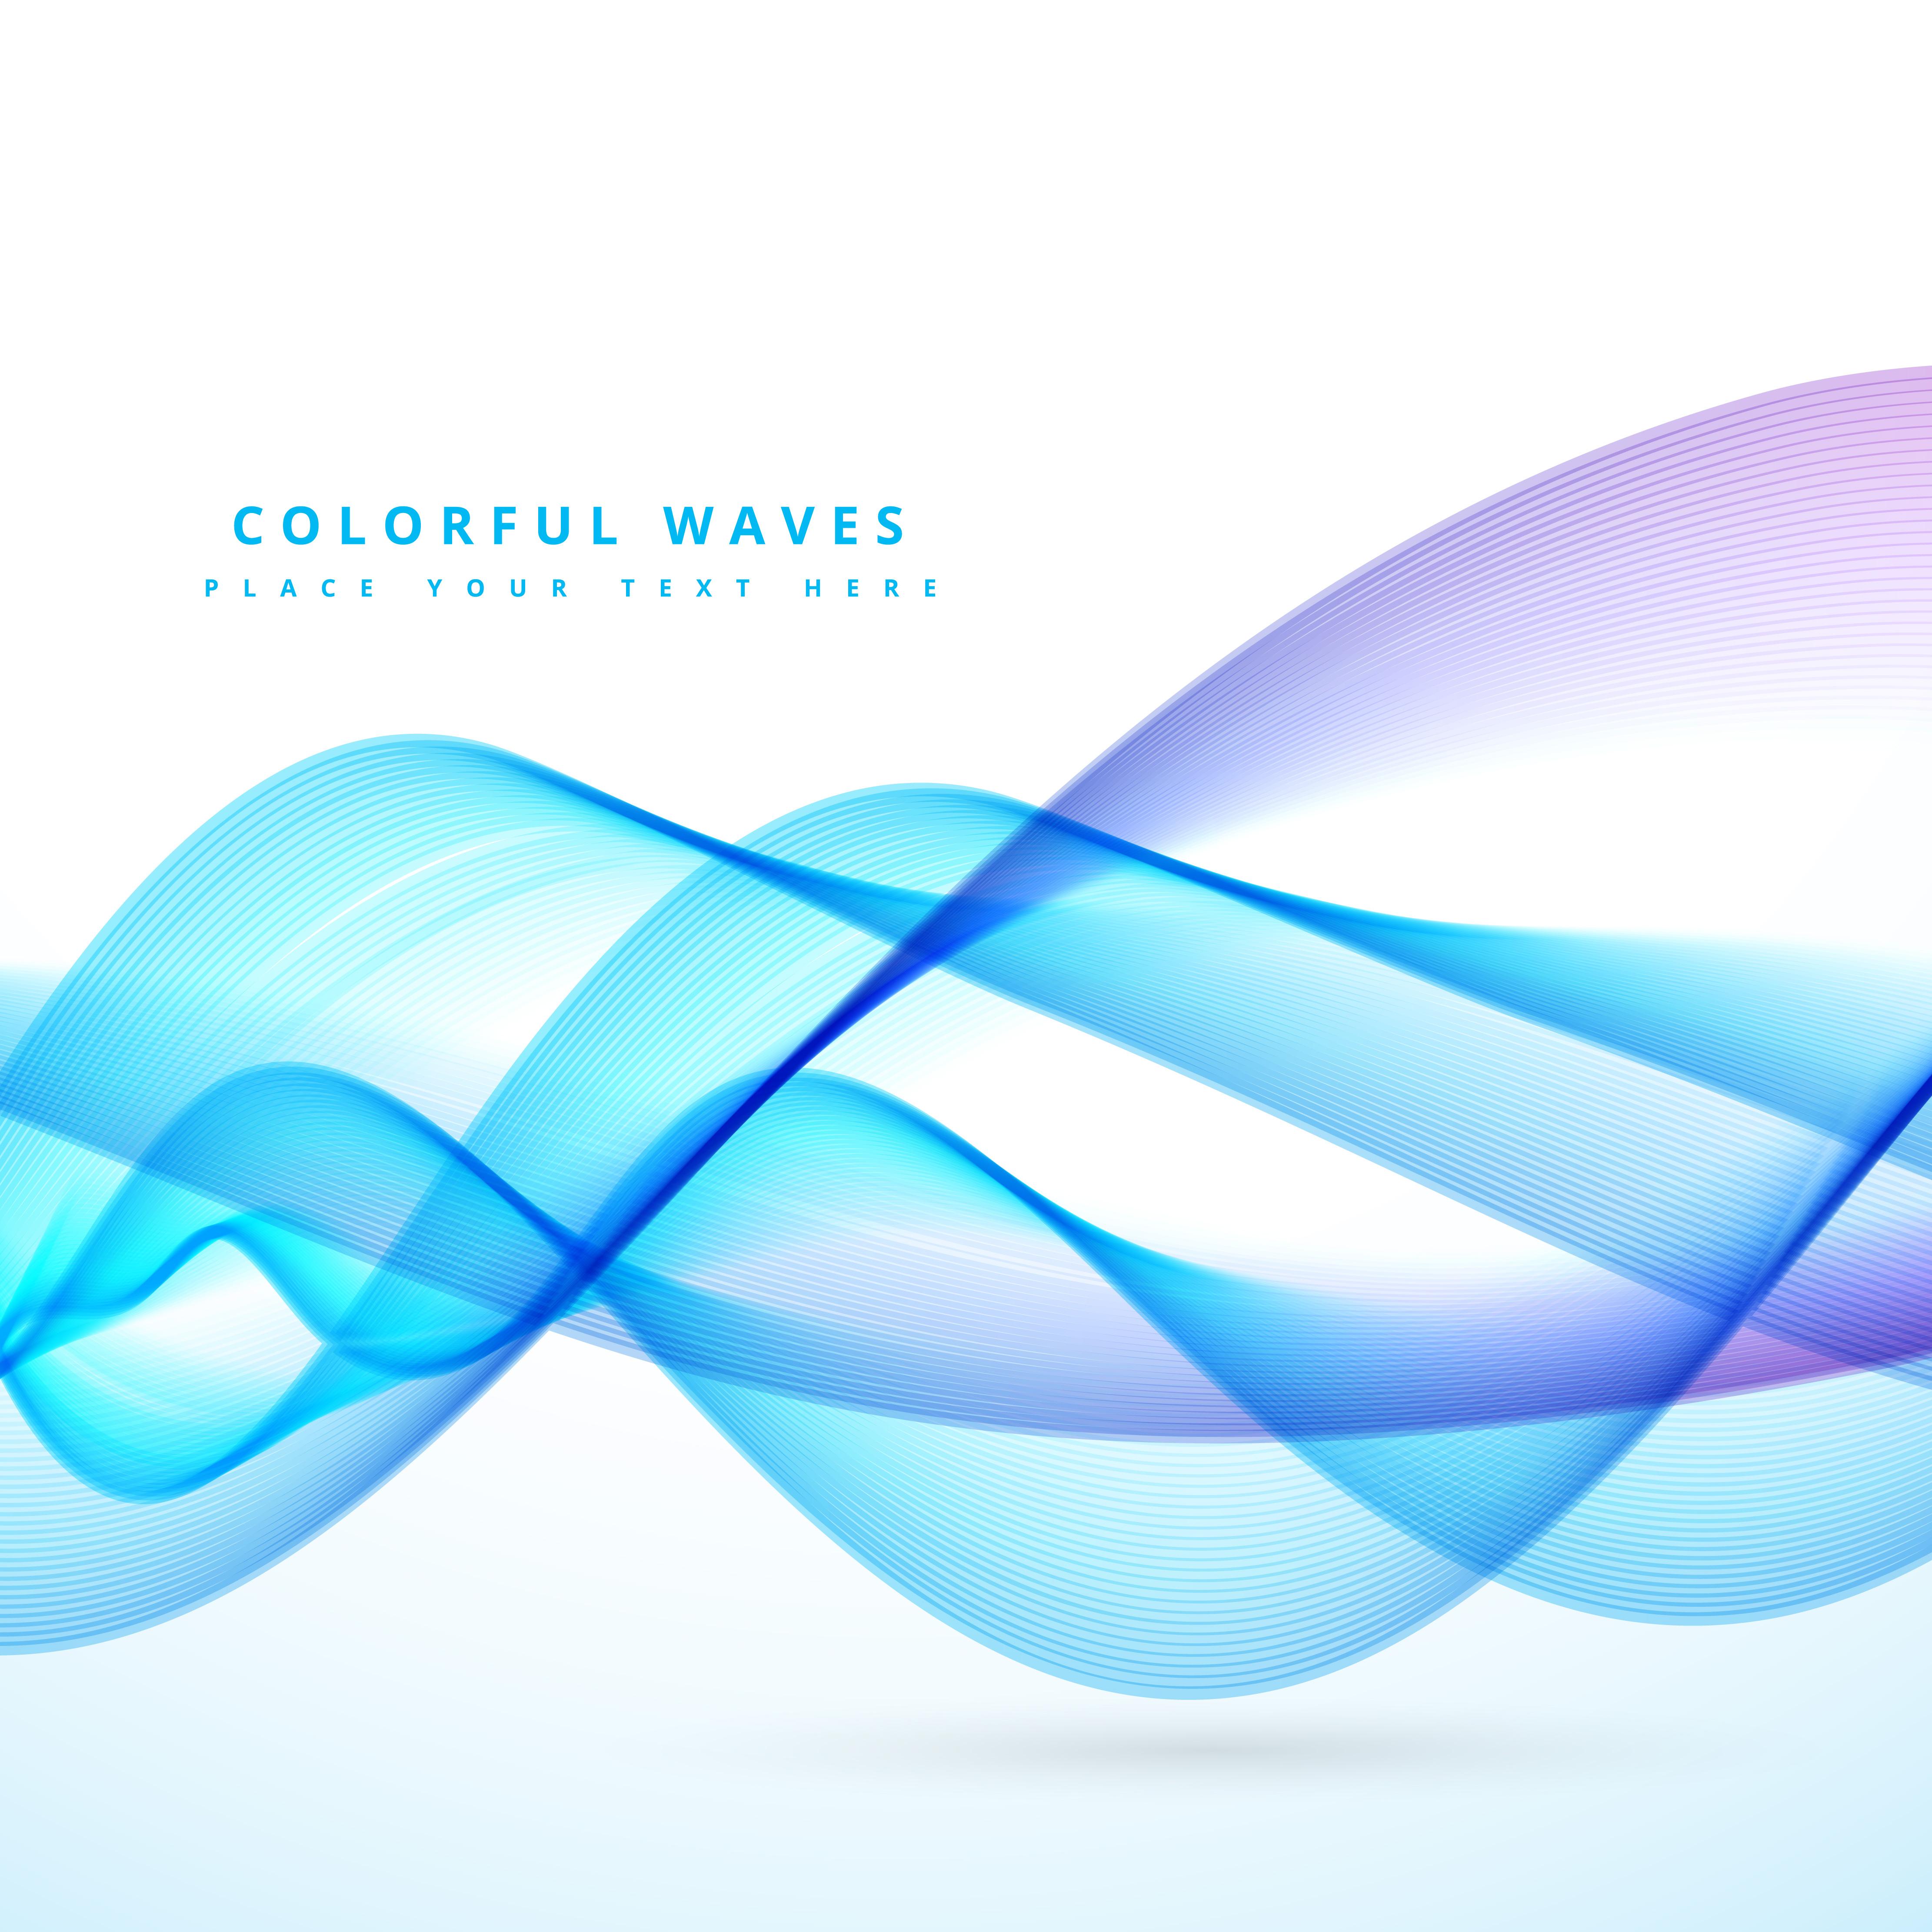 blue wave design - Download Free Vector Art, Stock ...